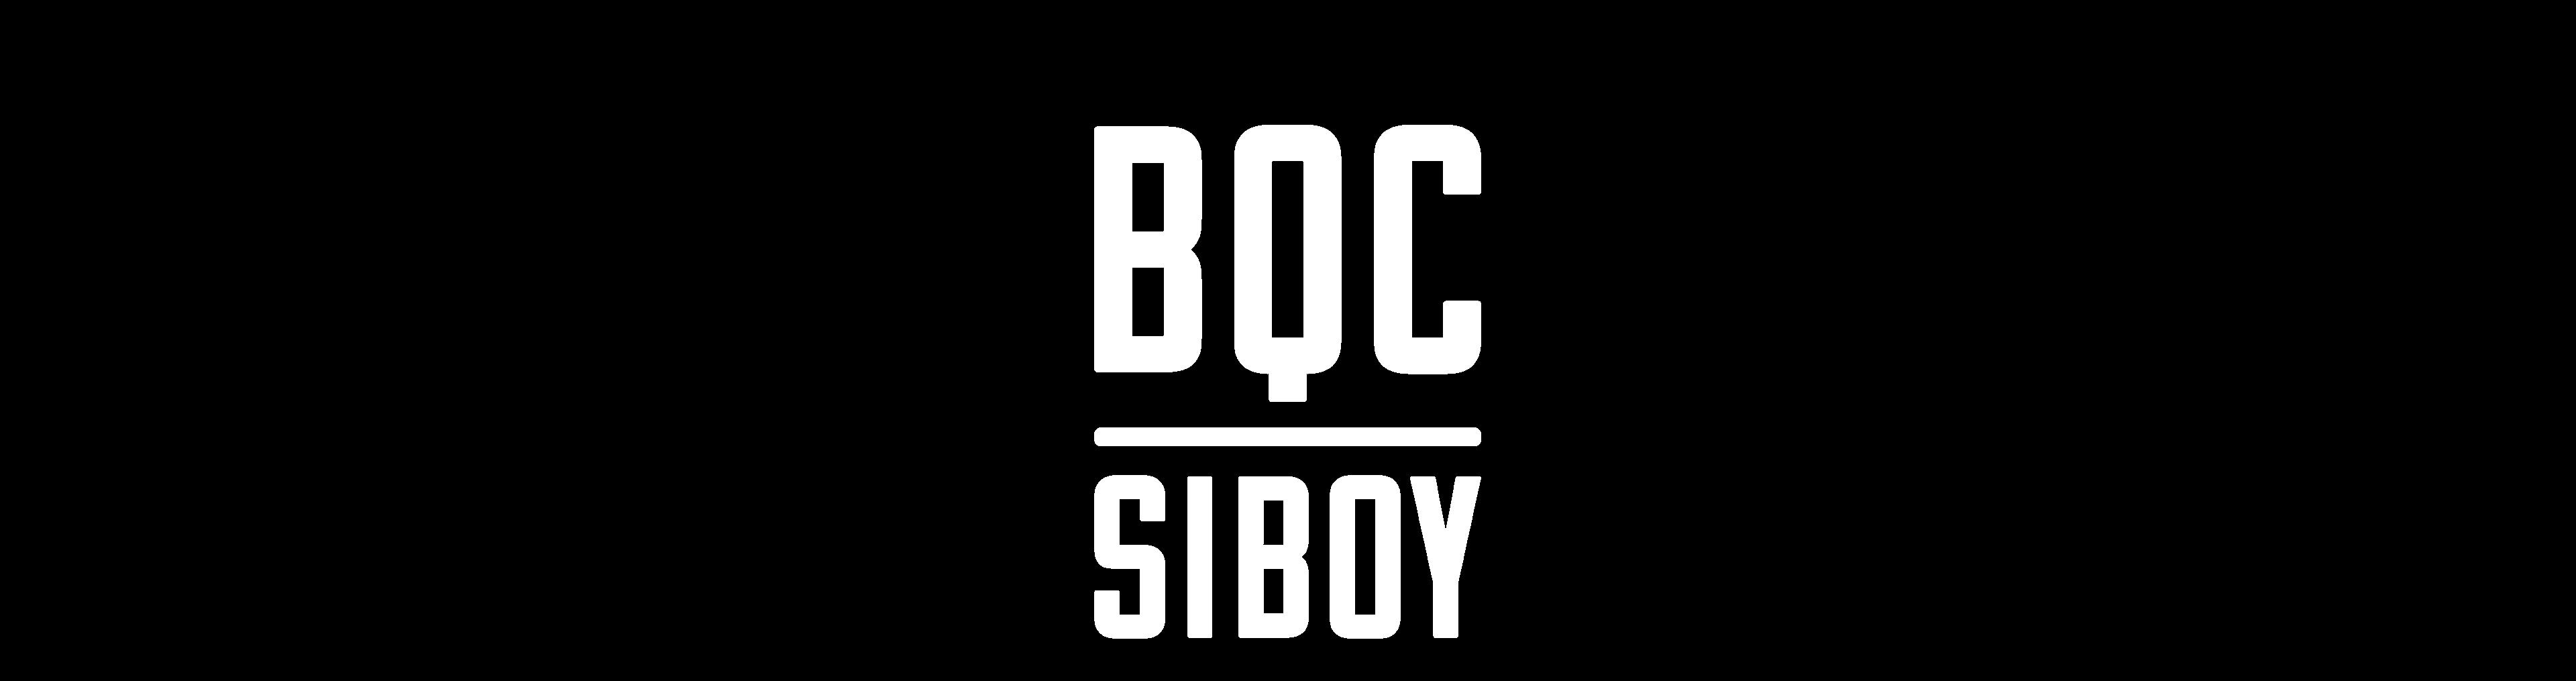 bqc siboy